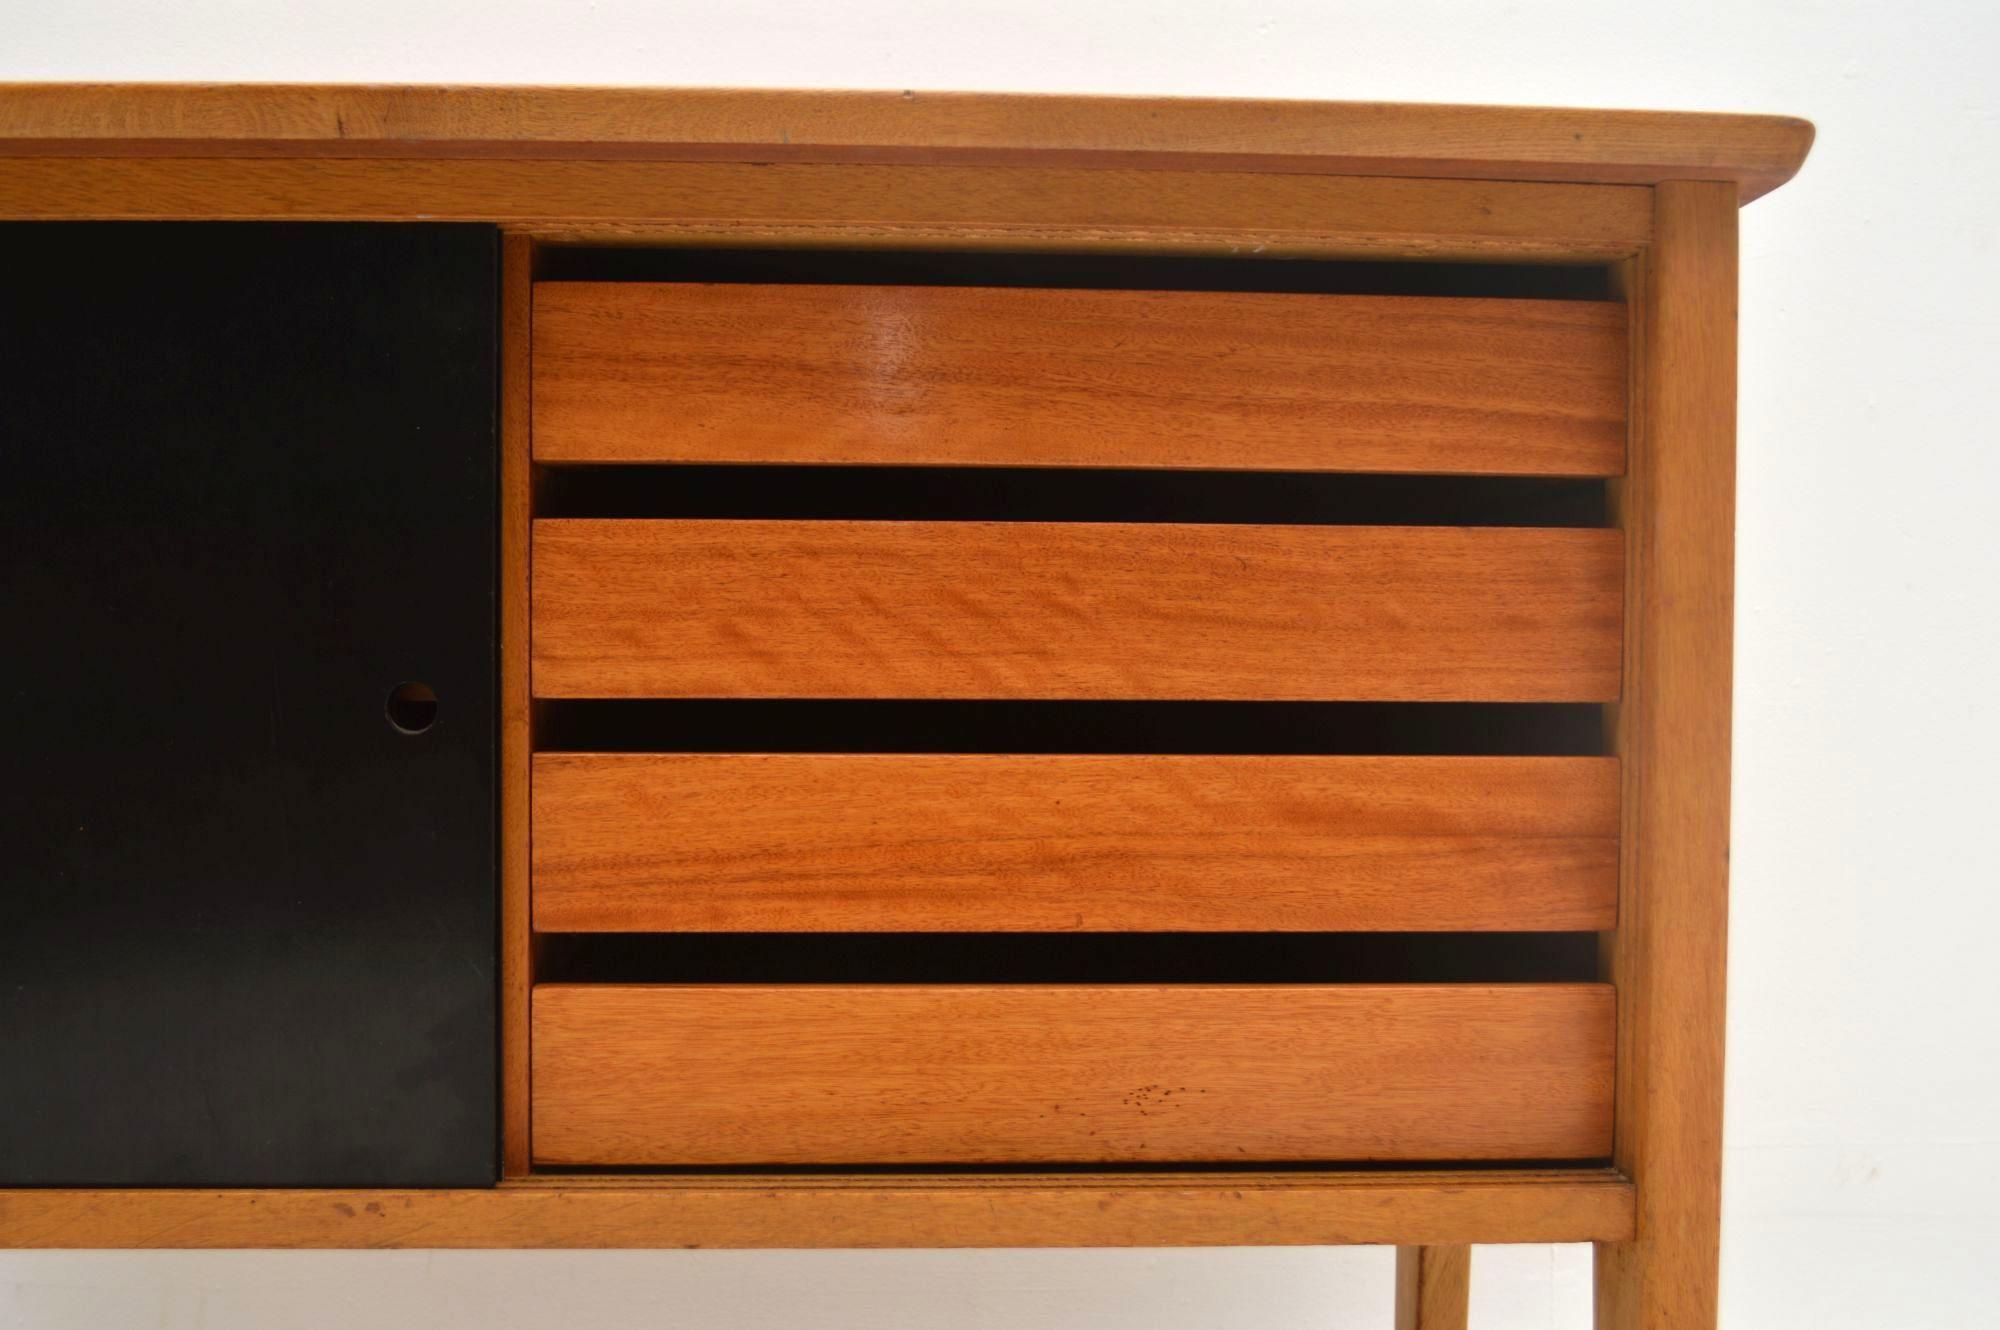 1950 u2019s Vintage Sideboard Chest of Drawers in Oak Retrospective Interiors u2013 vintage furniture